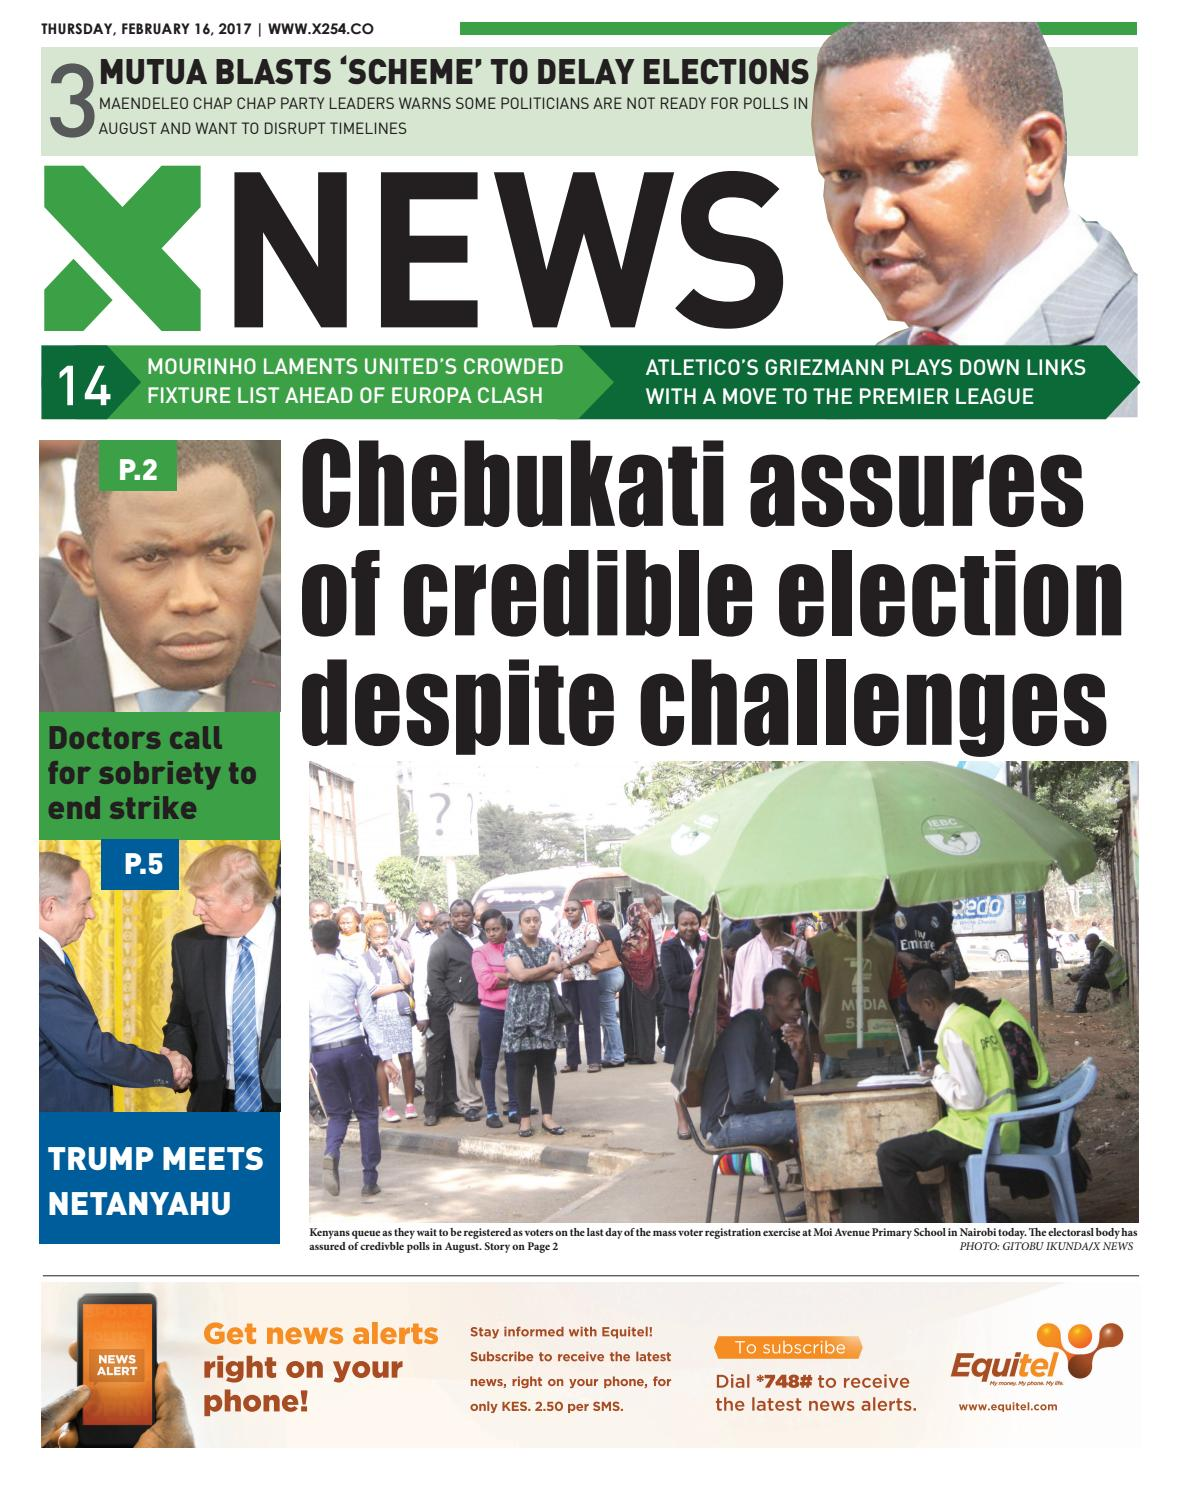 201702016 xnews by X News - issuu